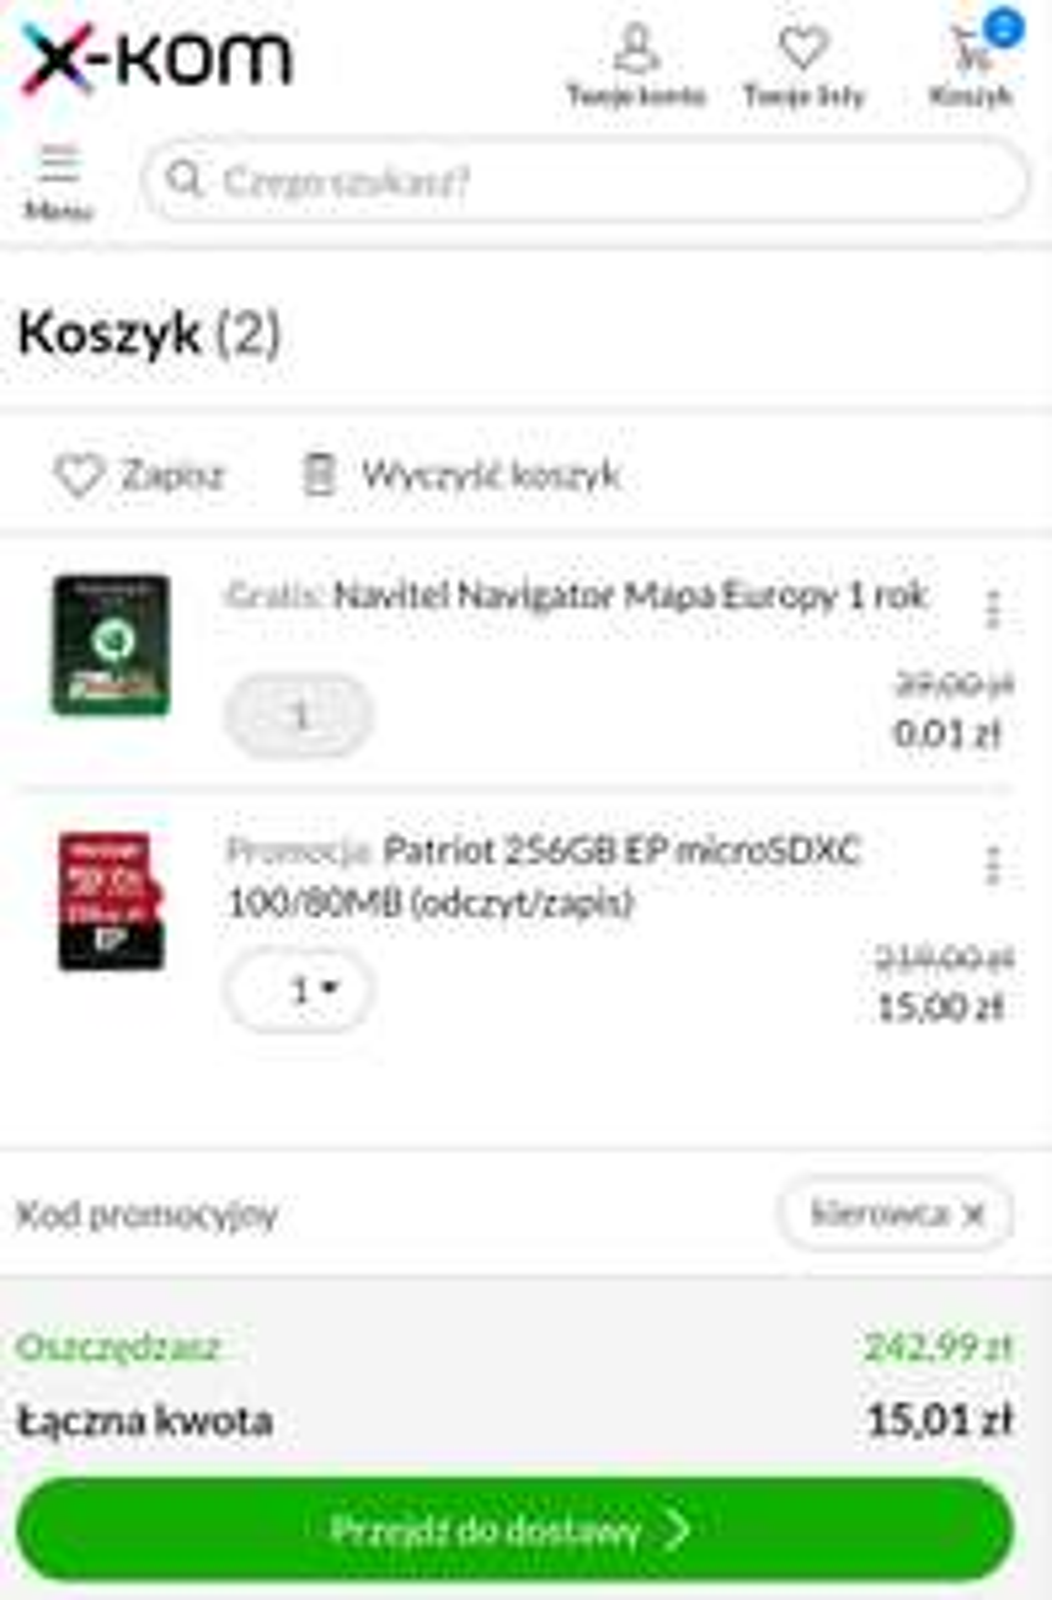 Karta Patriot 256GB EP microSDXC za 15zł - XKOM